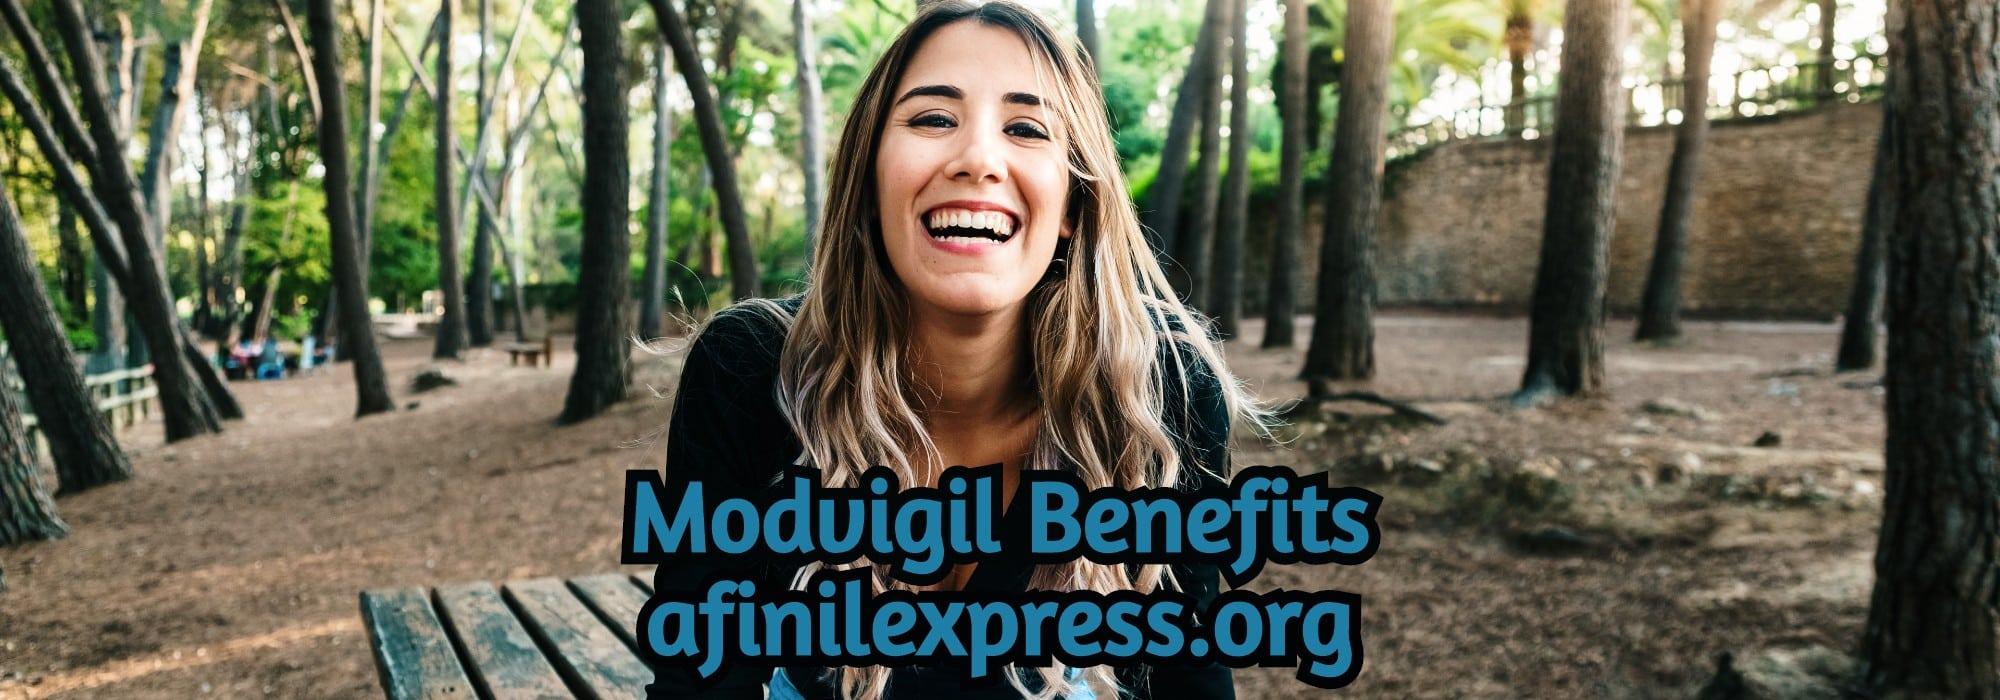 modafinil benefits, afinilexpress.org